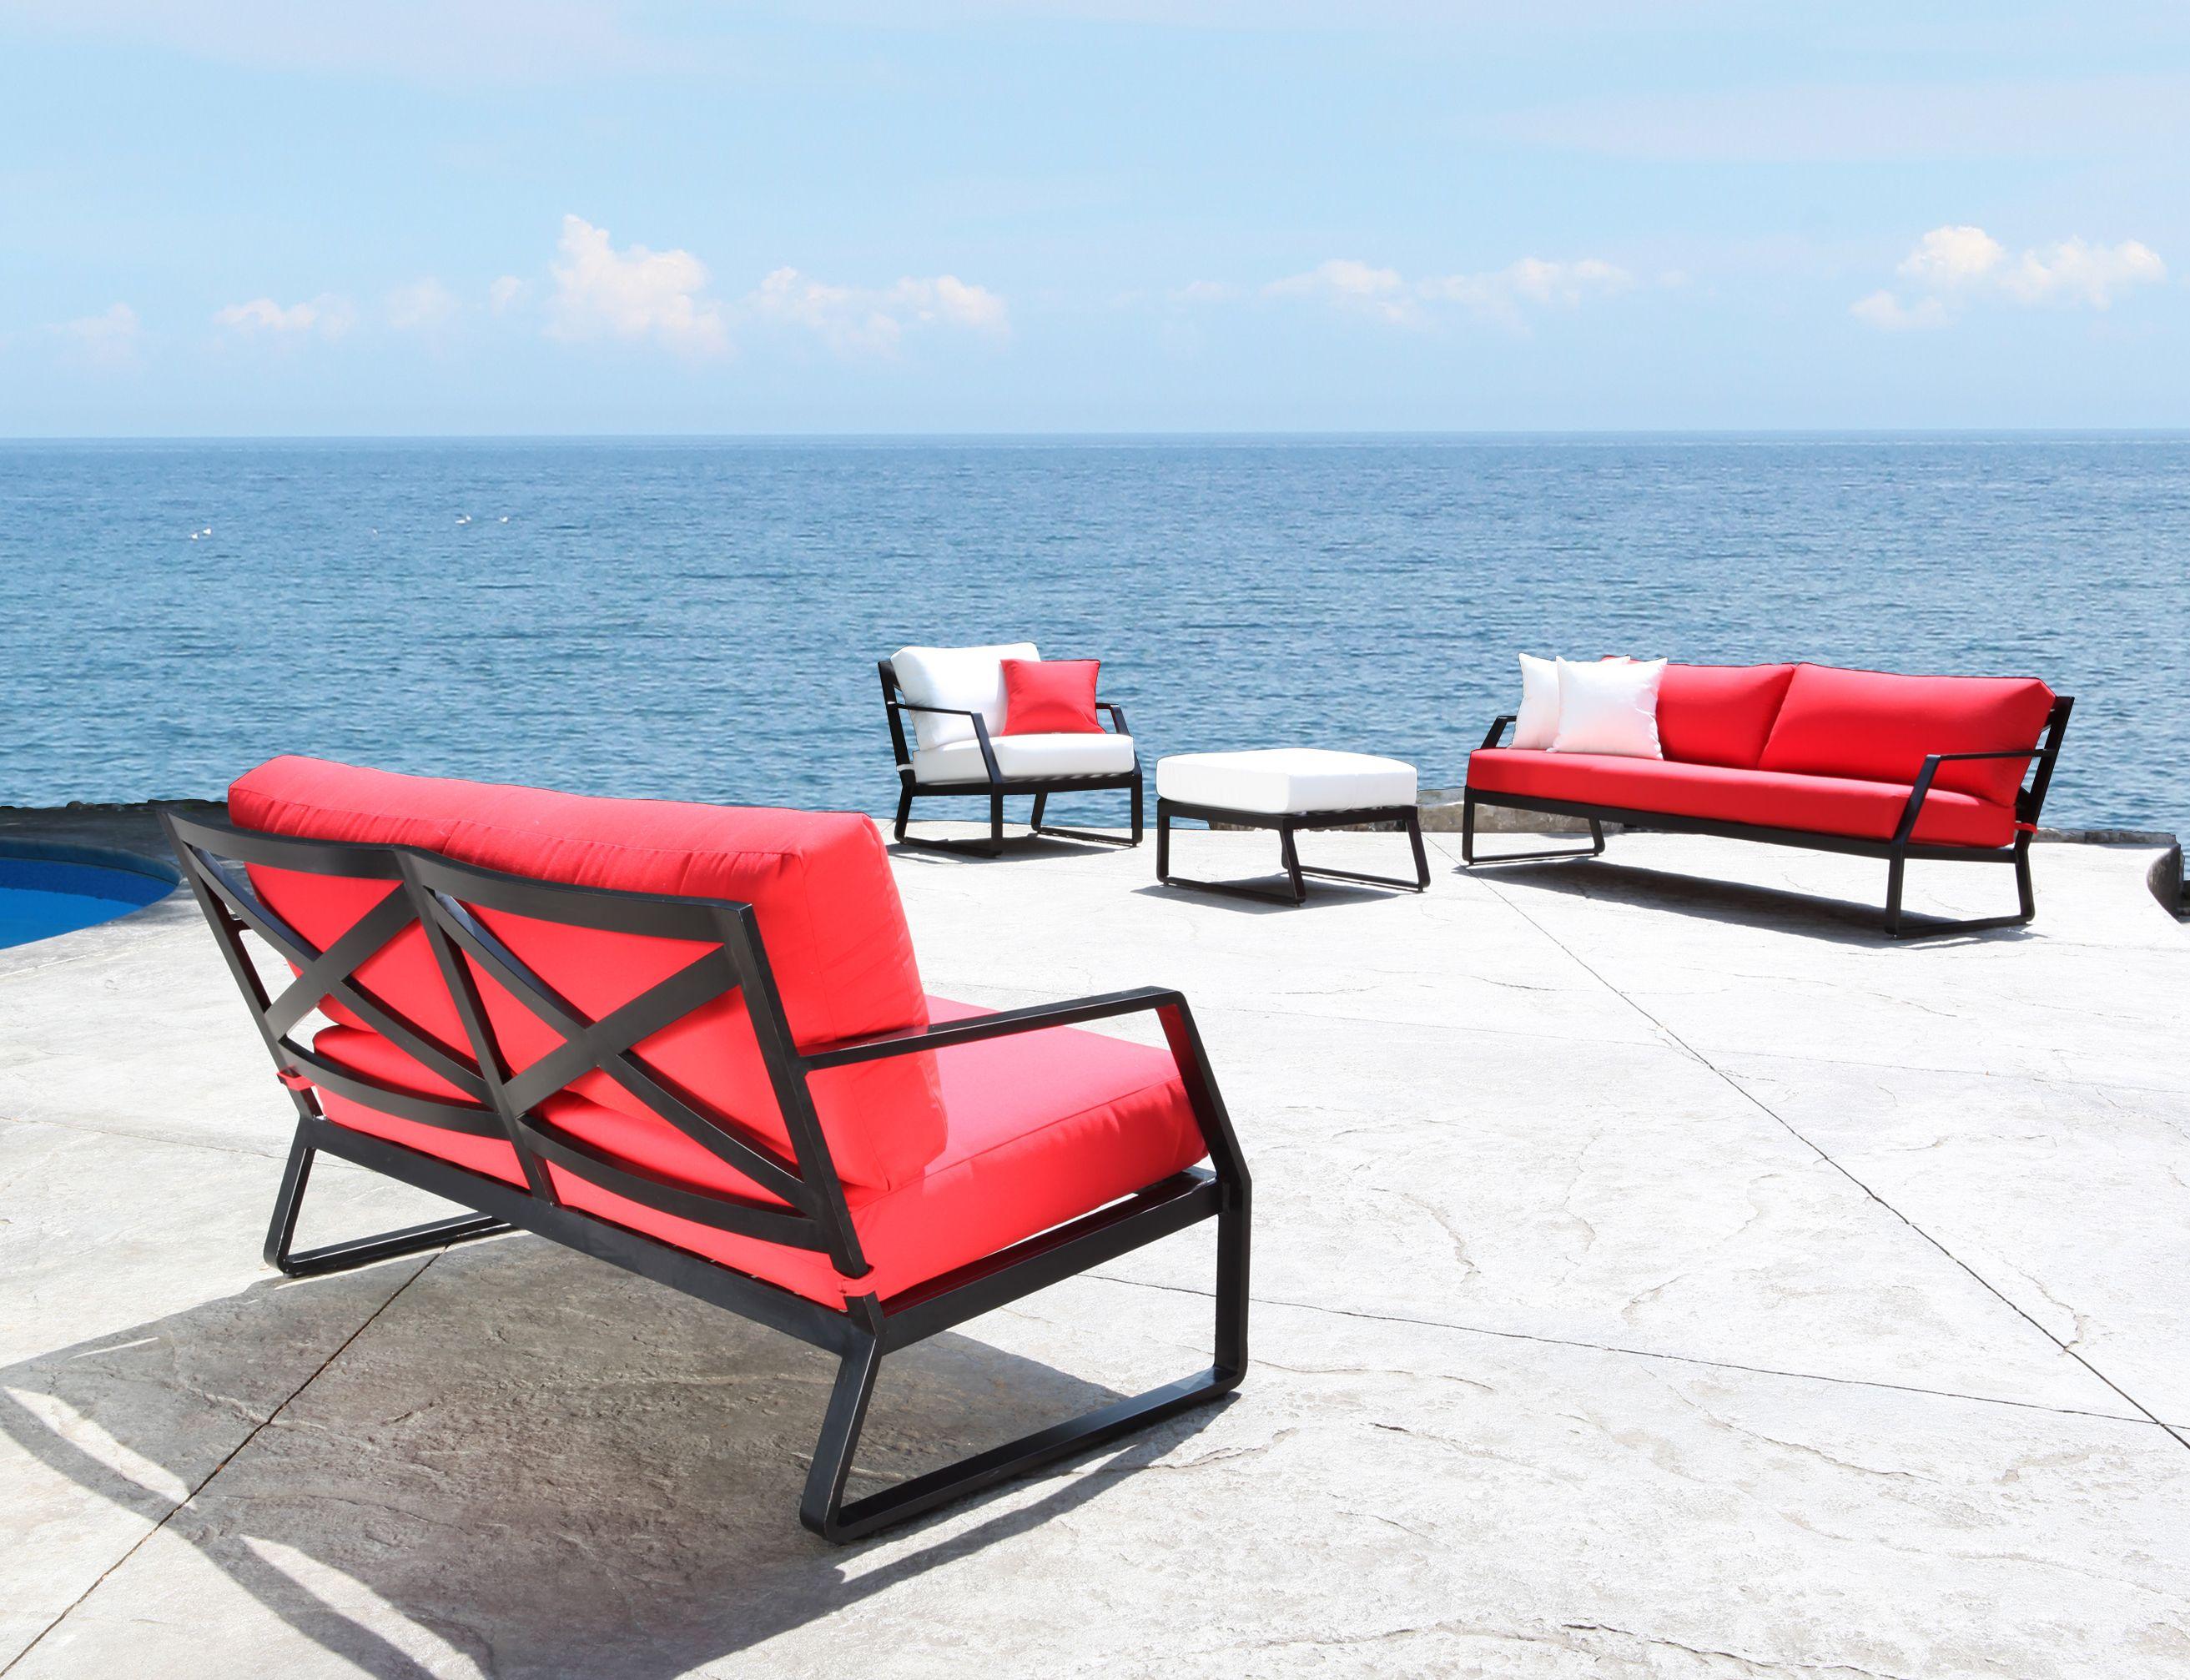 Cabana Coast By Actiwin Patio Furniture The Great Outdoors Pinterest Cabana